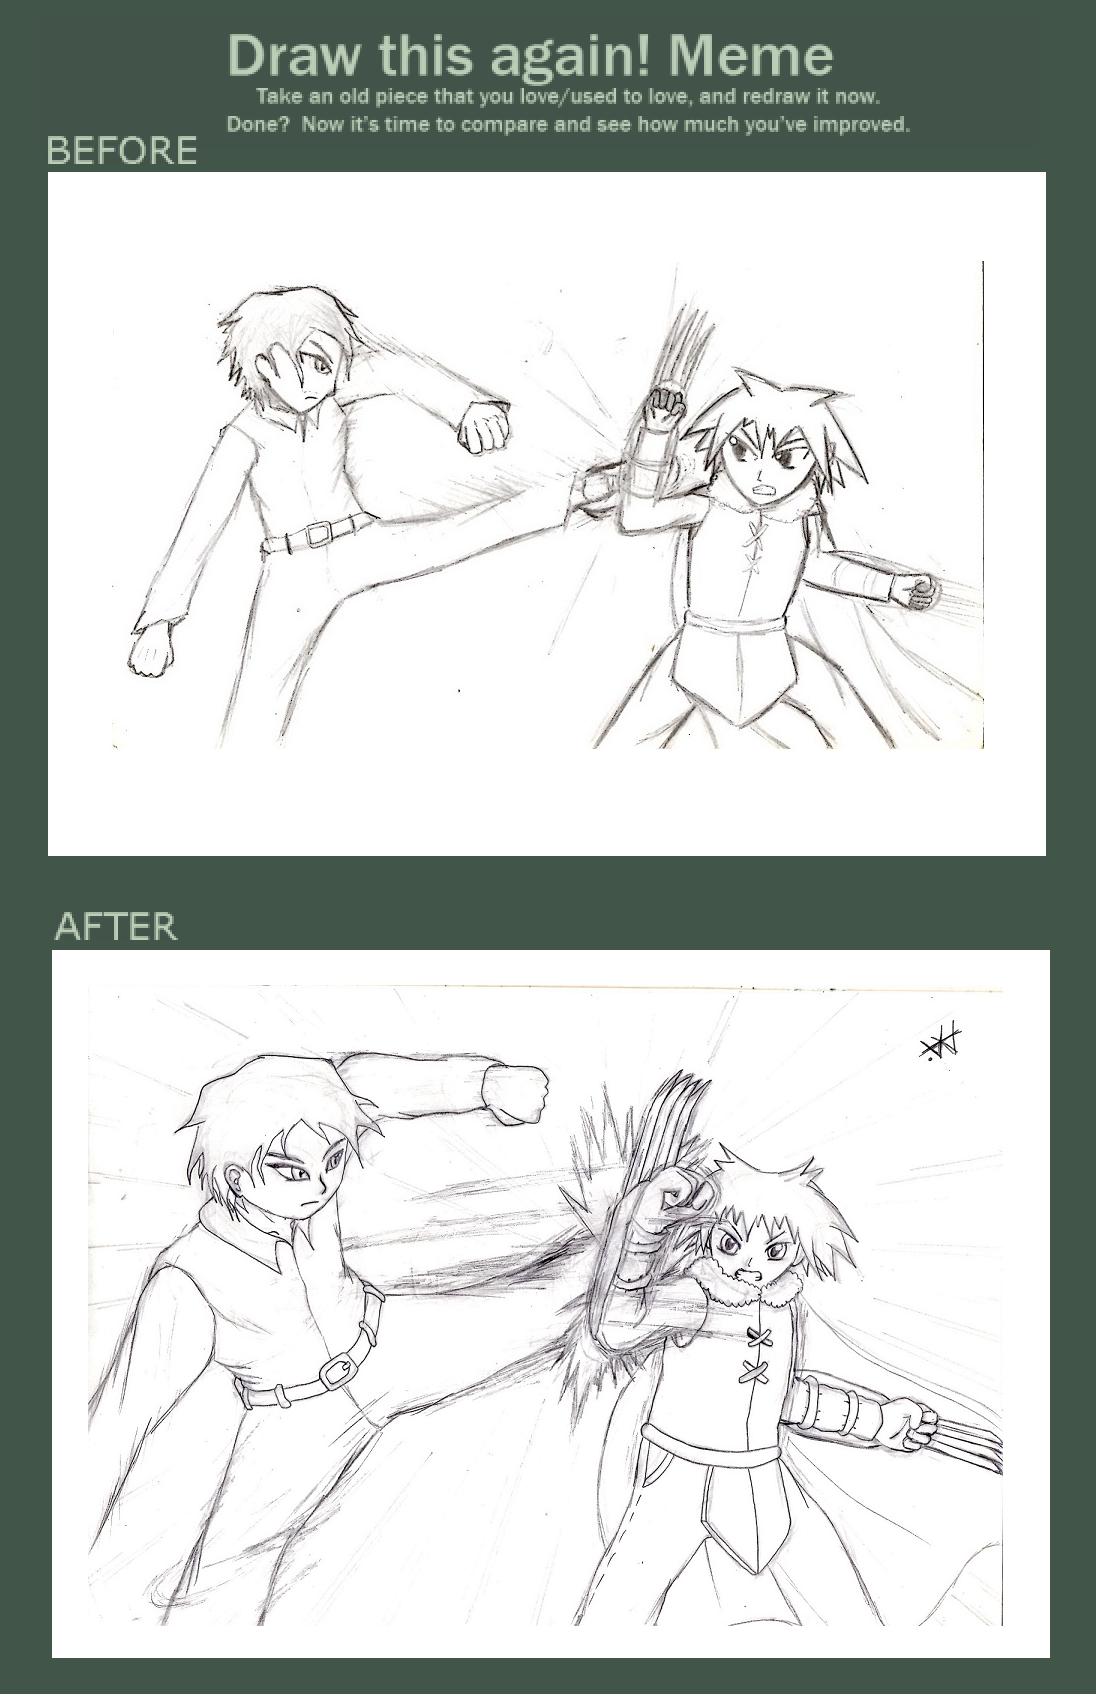 Draw this again! 1